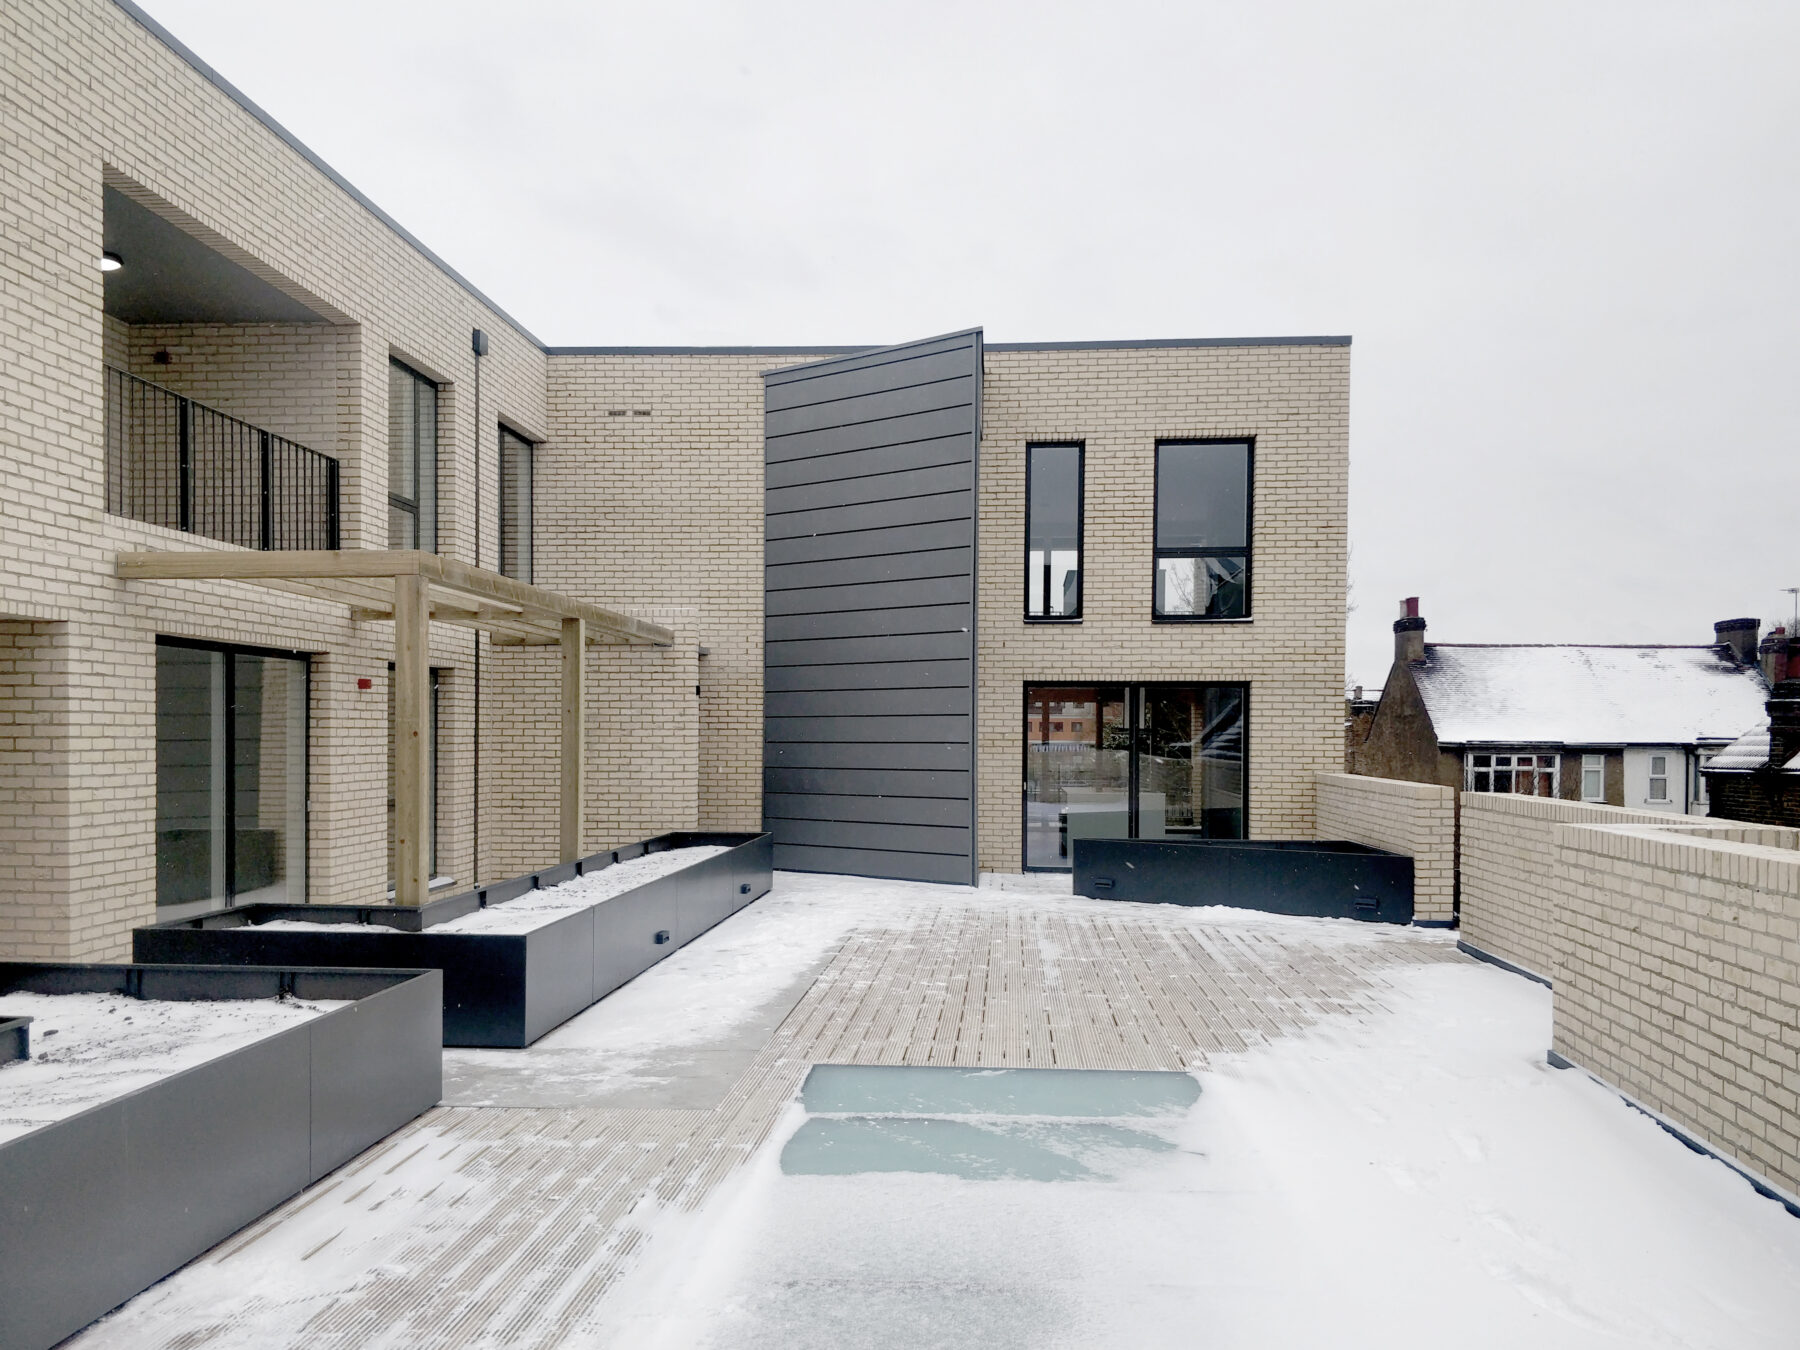 Water Lane Terrace Planters Residential Brick Metal